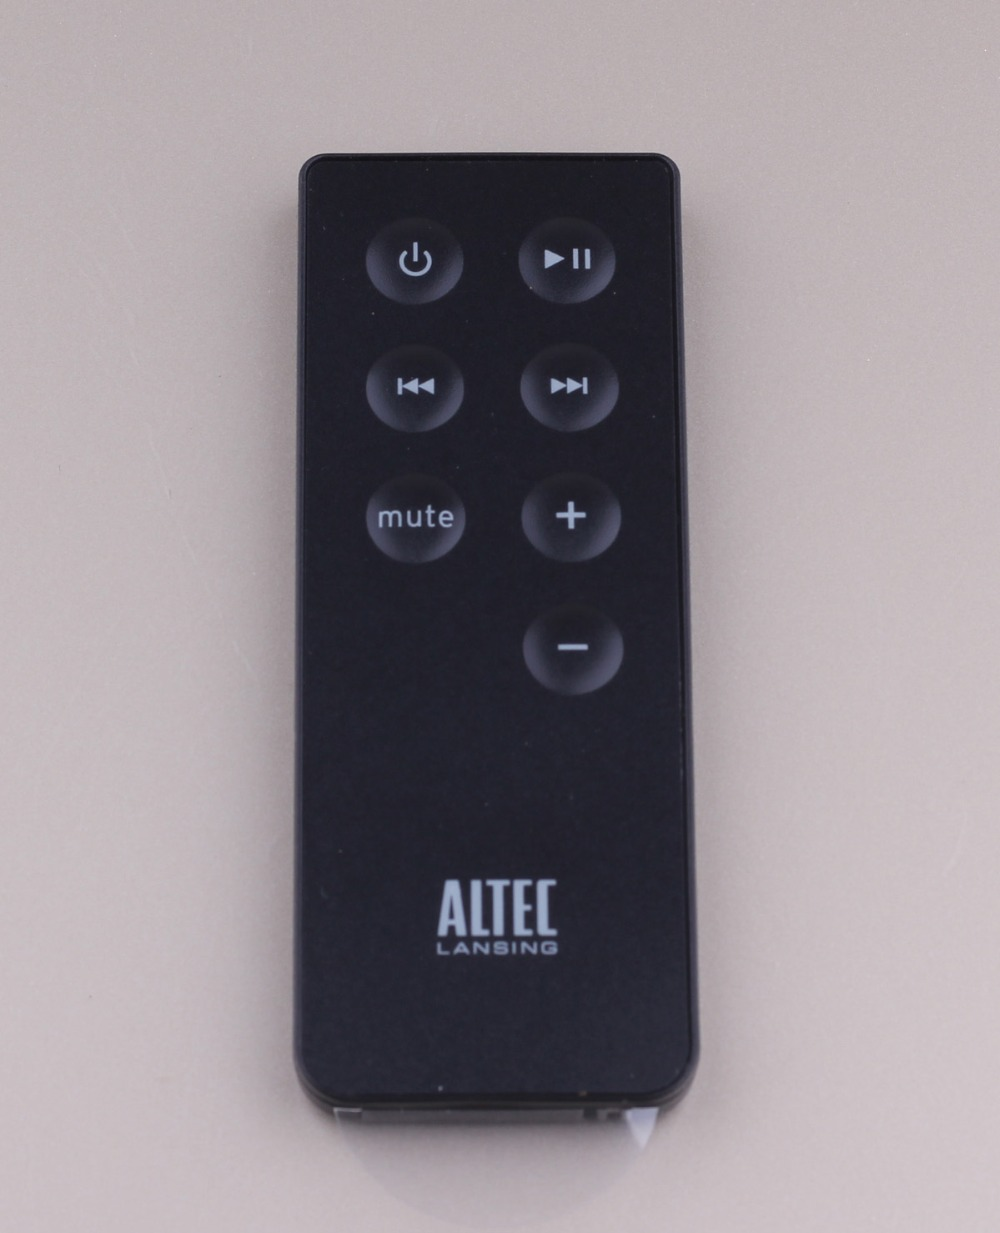 US $12 8  REMOTE CONTROL FOR ALTEC LANSING Octiv 650 M650 IMT702 iMT630  iMT620 IMT520 T612-in Remote Controls from Consumer Electronics on